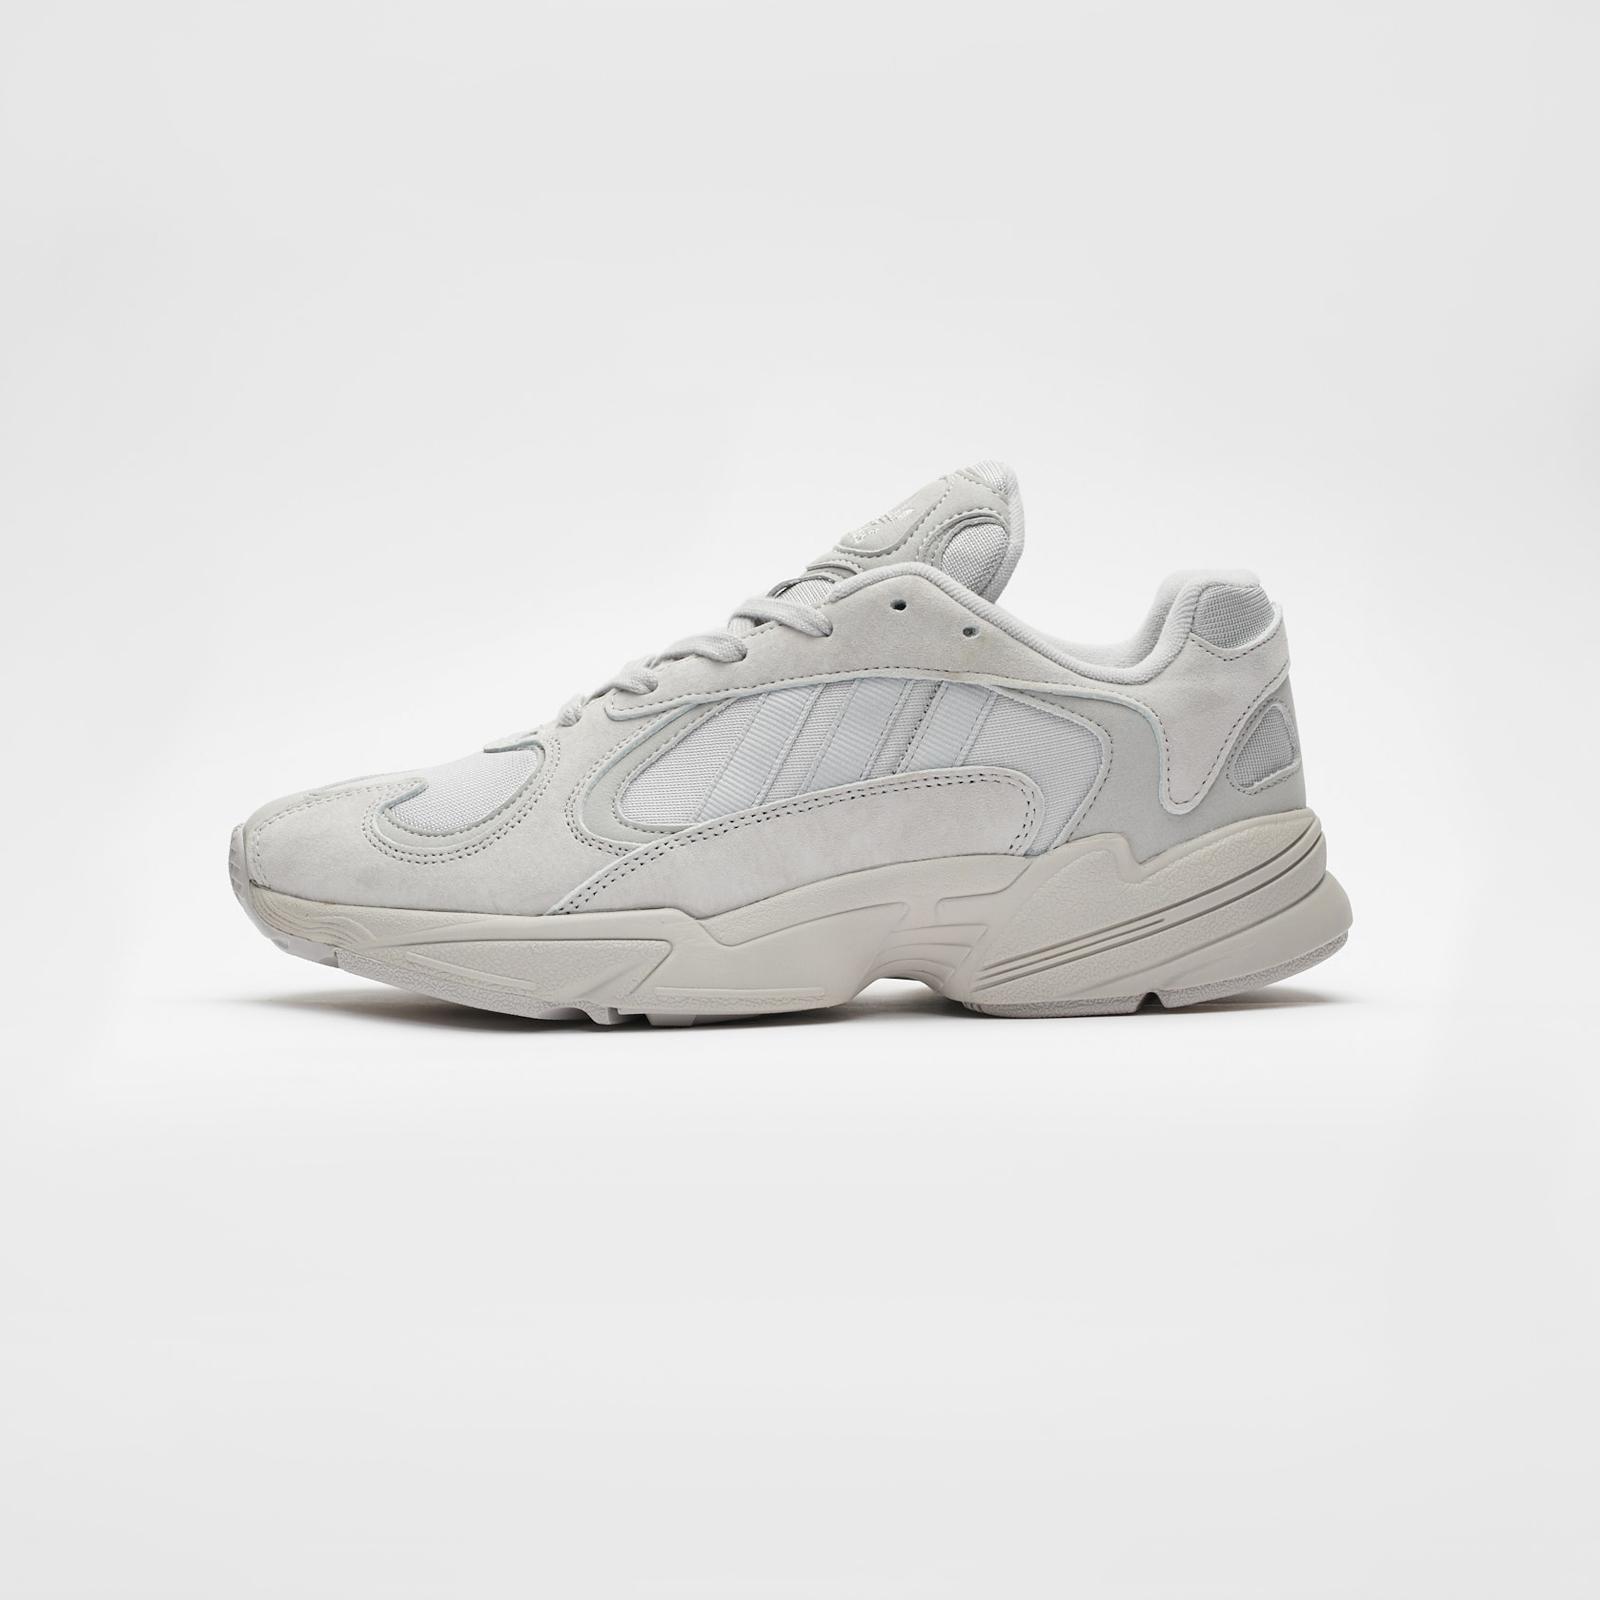 02d2a12520e adidas Yung 1 - F37070 - Sneakersnstuff